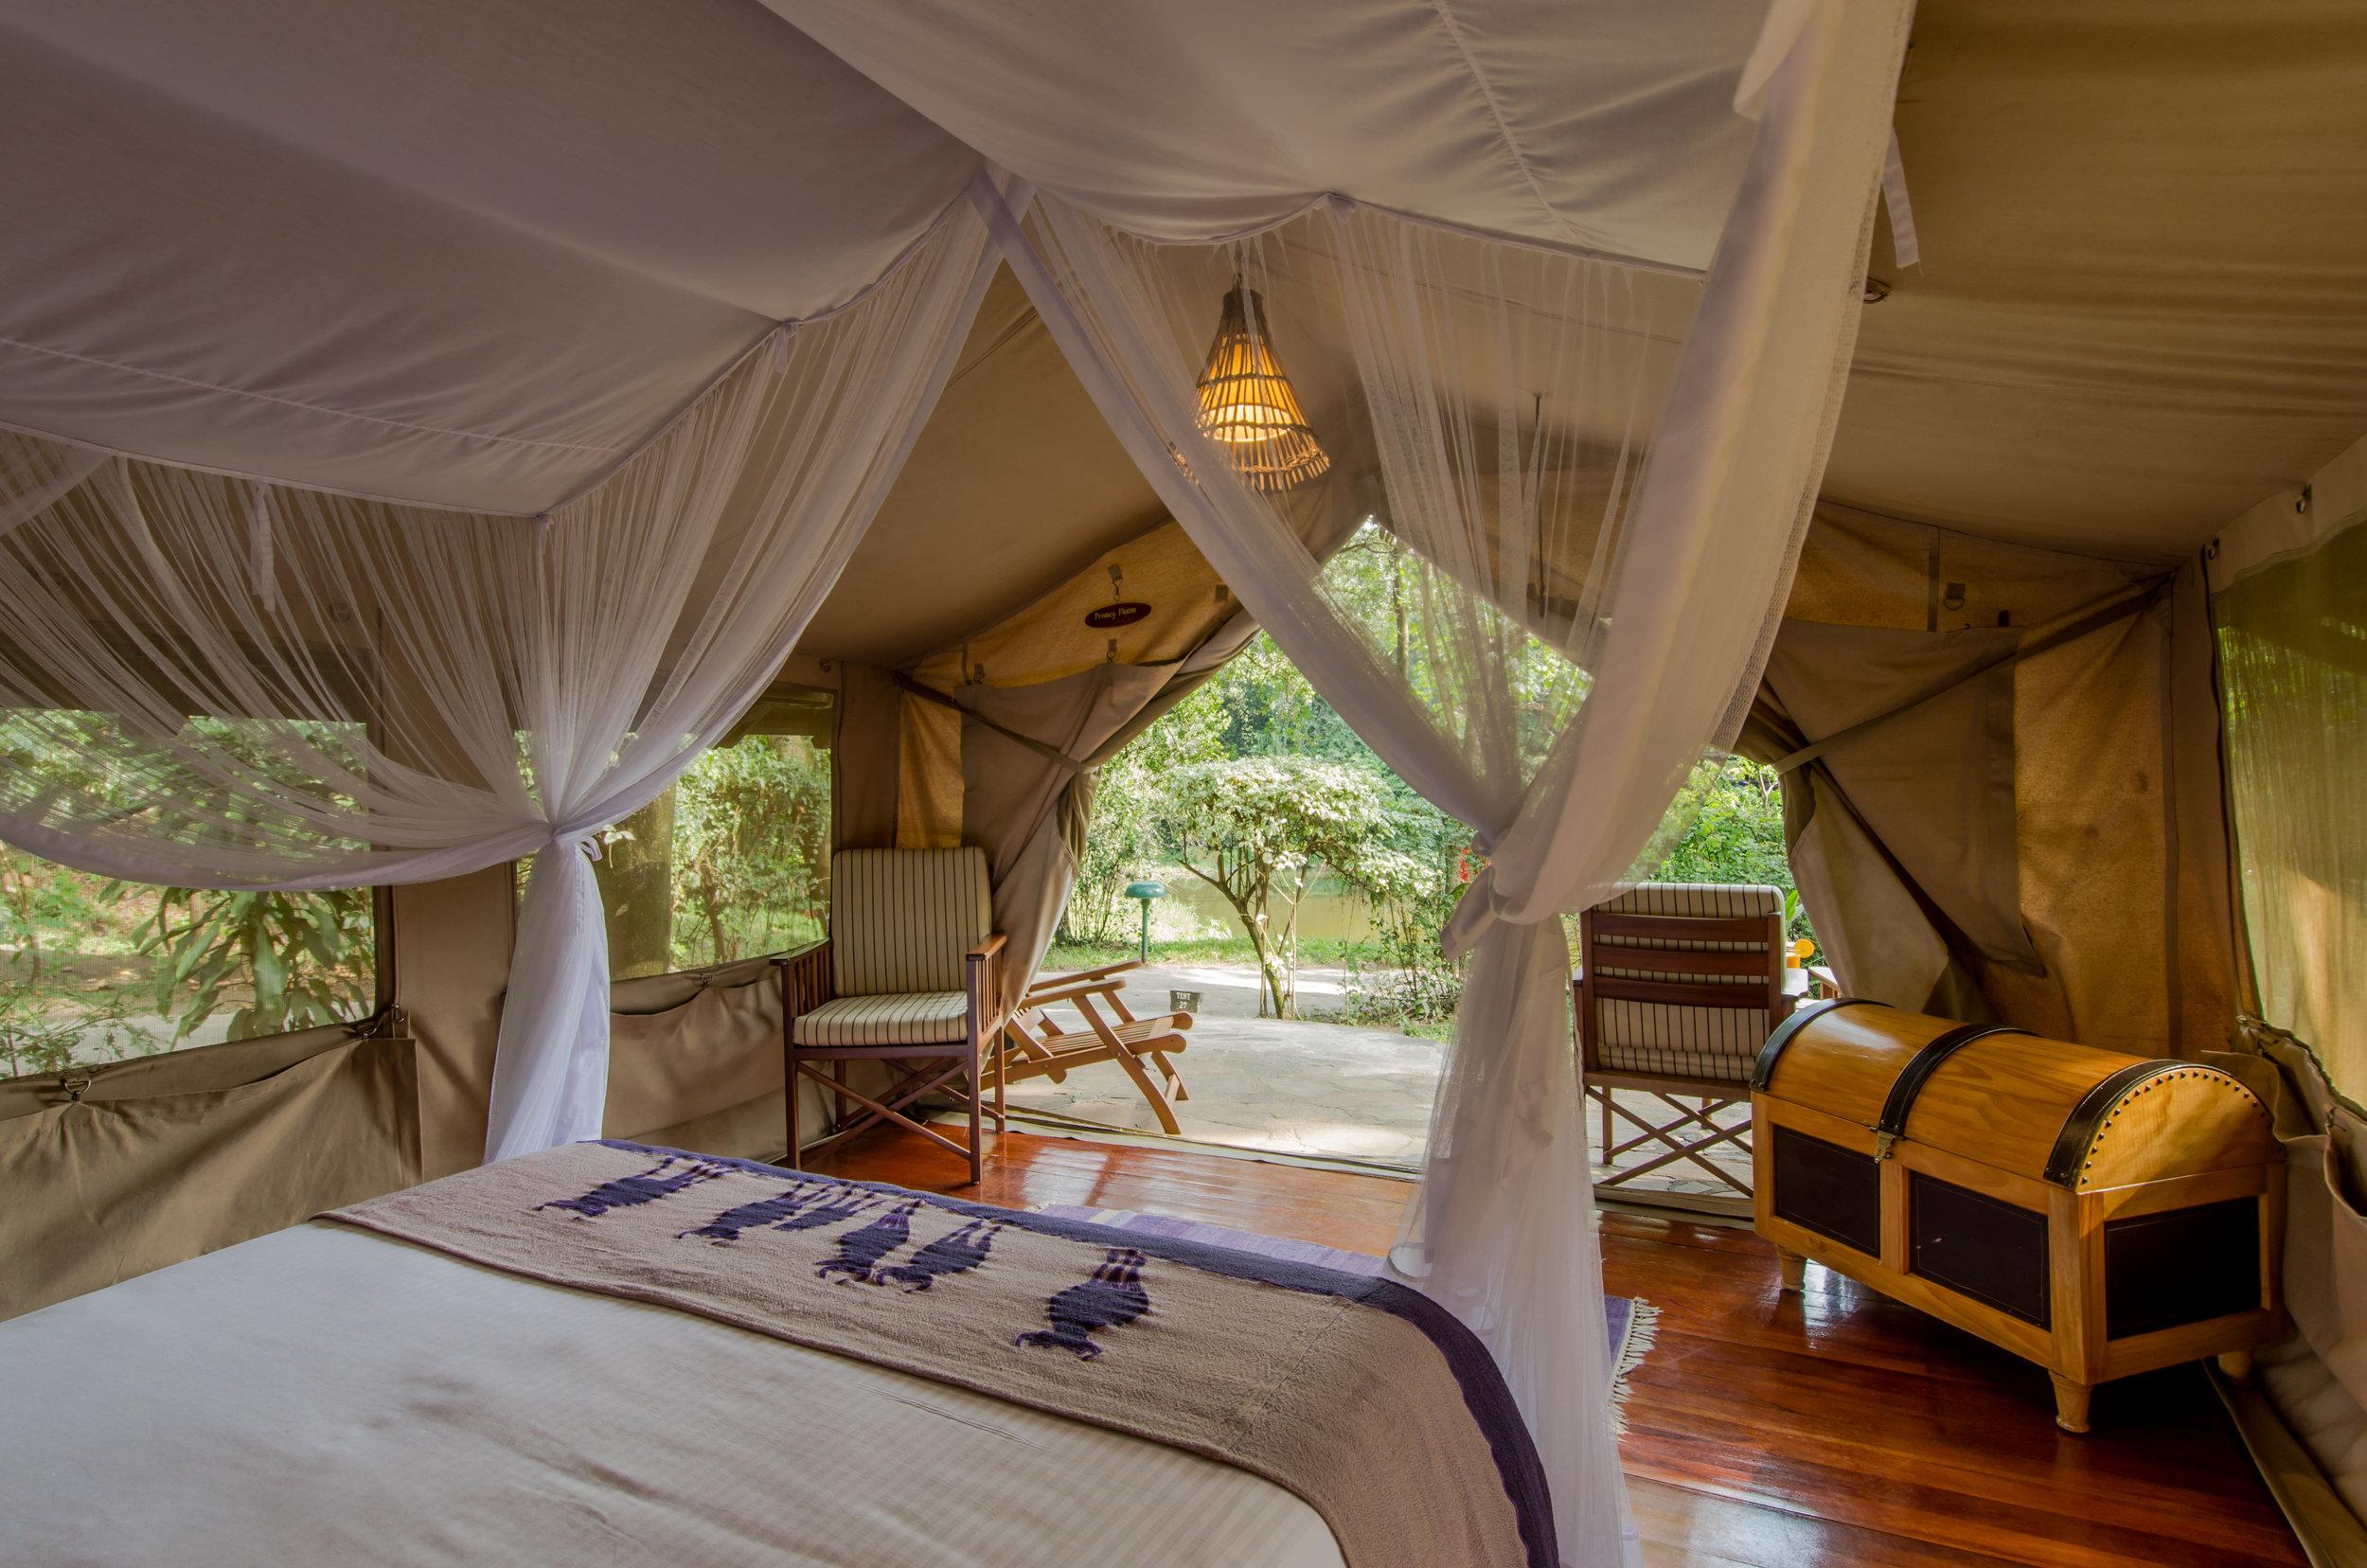 Day 5 - Depart to Sarova Mara Game Camp, Masai Mara National Reserve